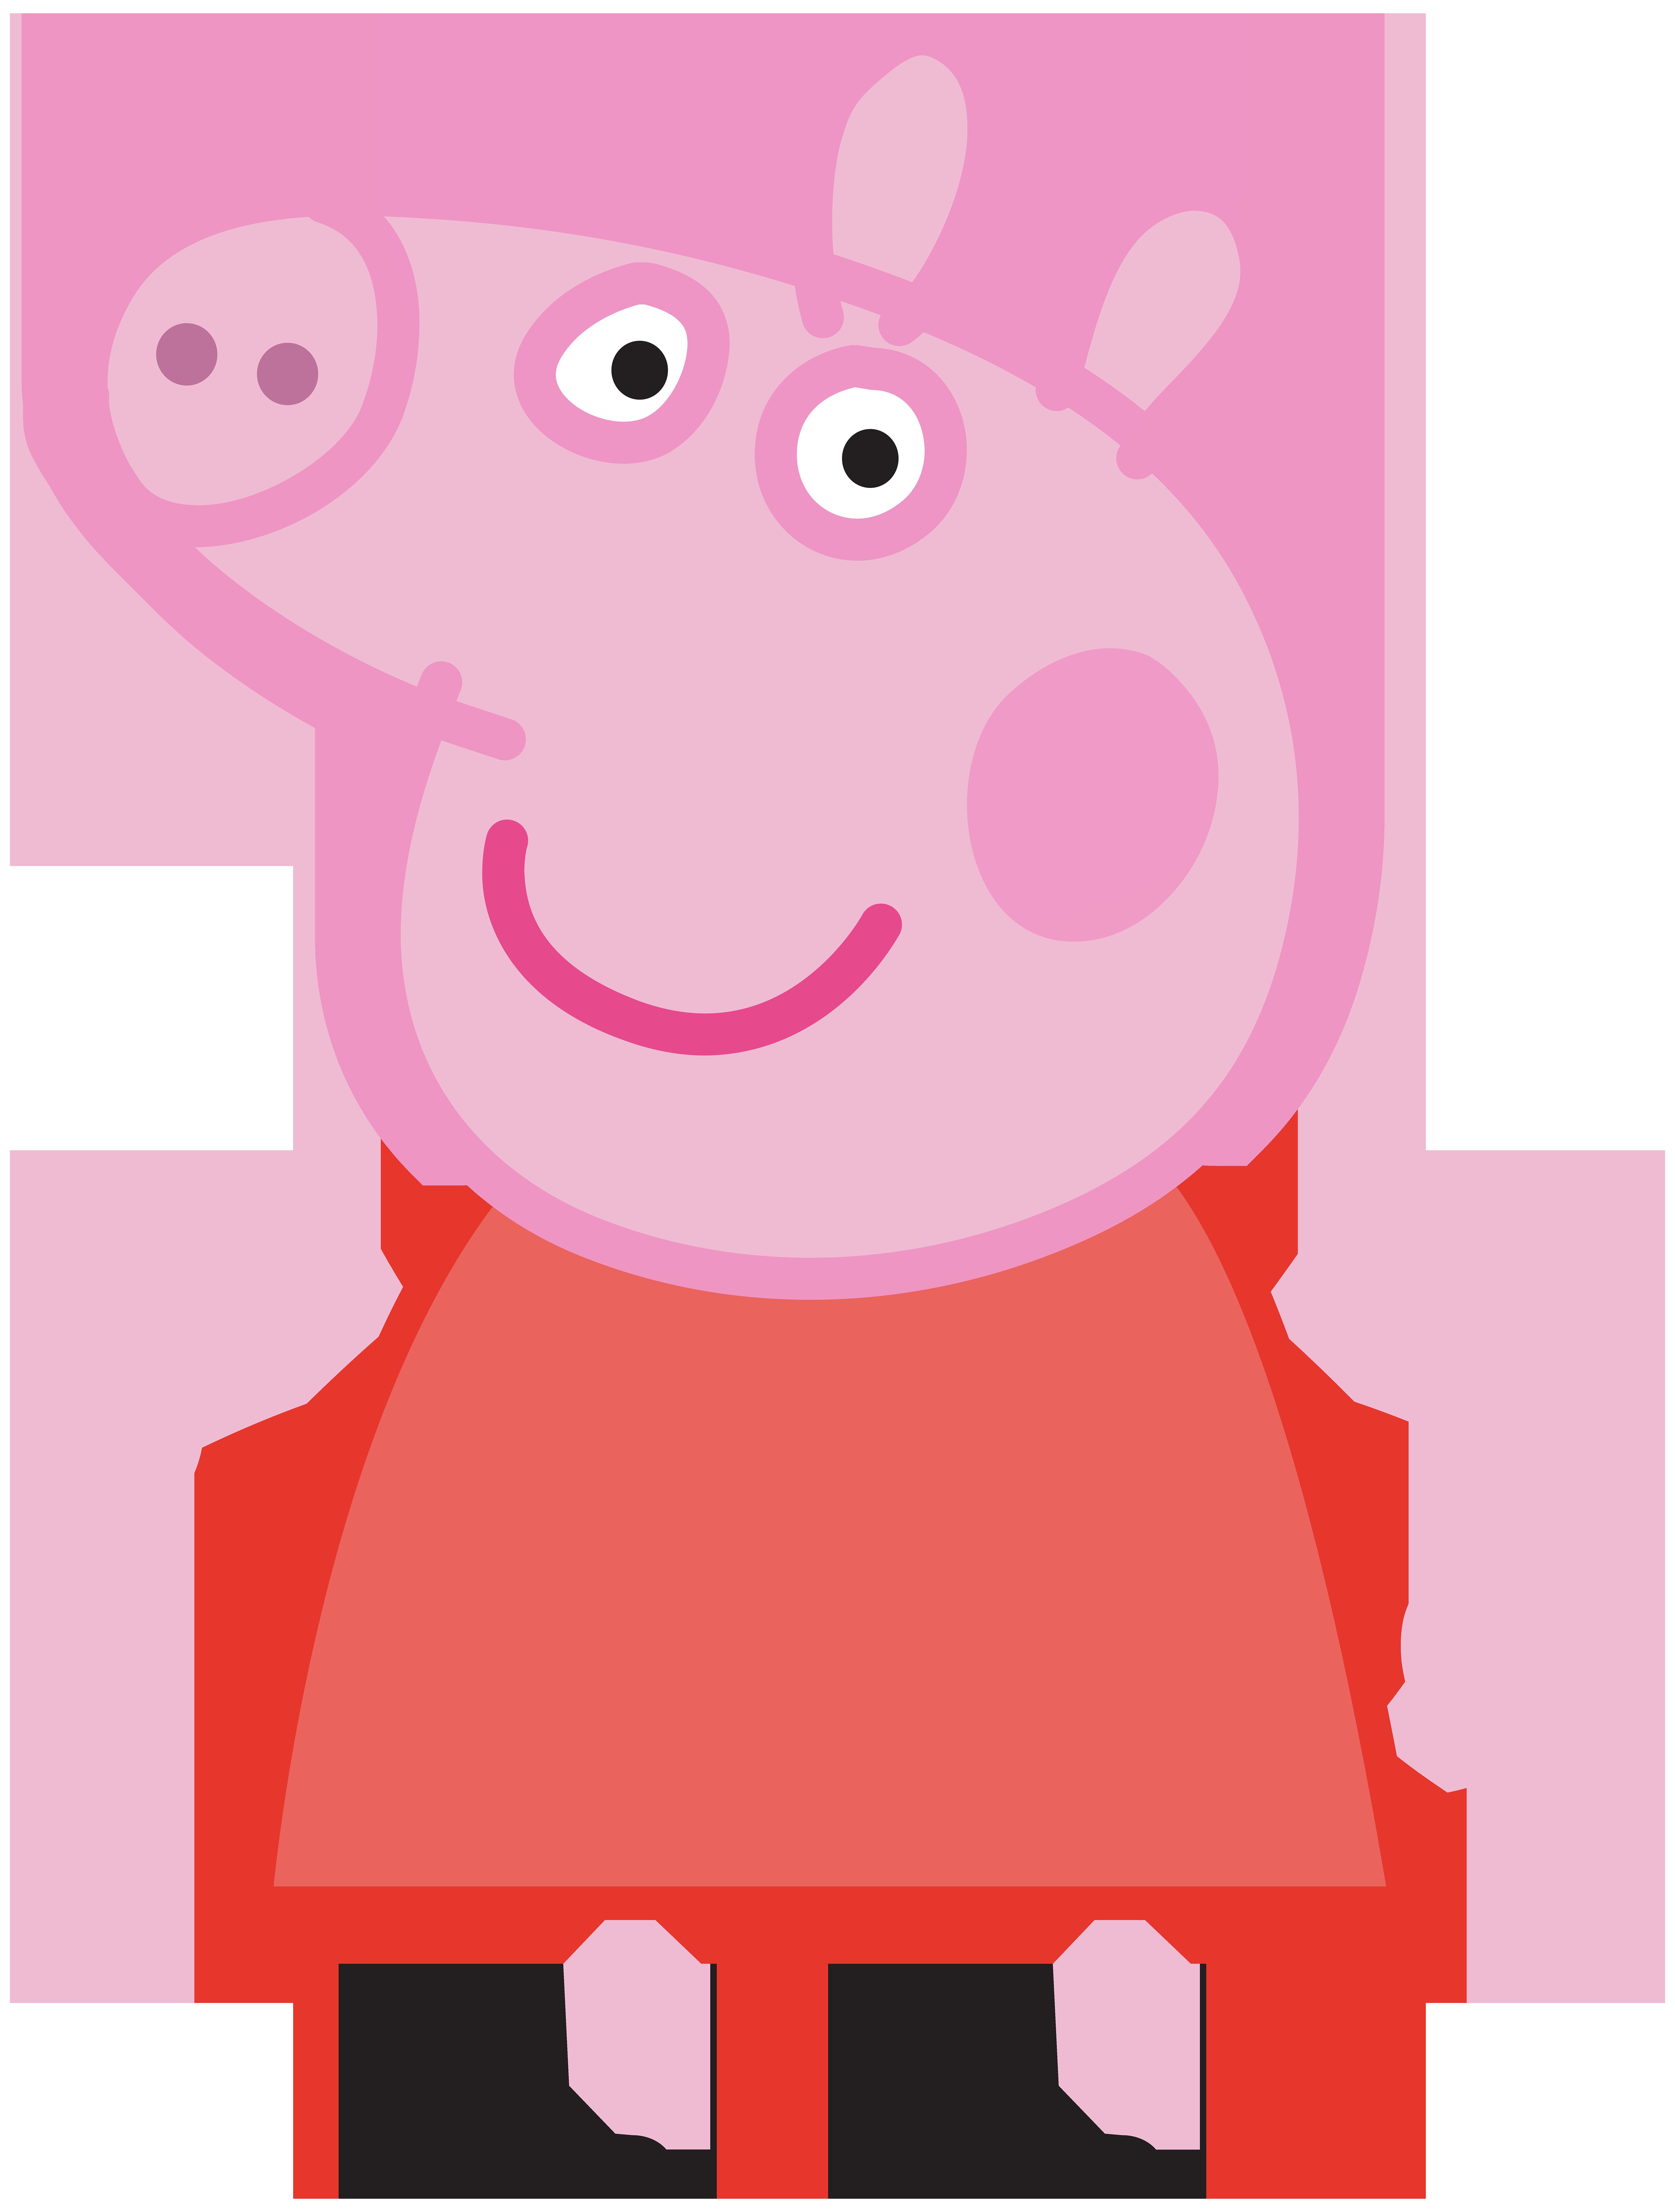 Free Peppa Pig Clipart at GetDrawings.com.